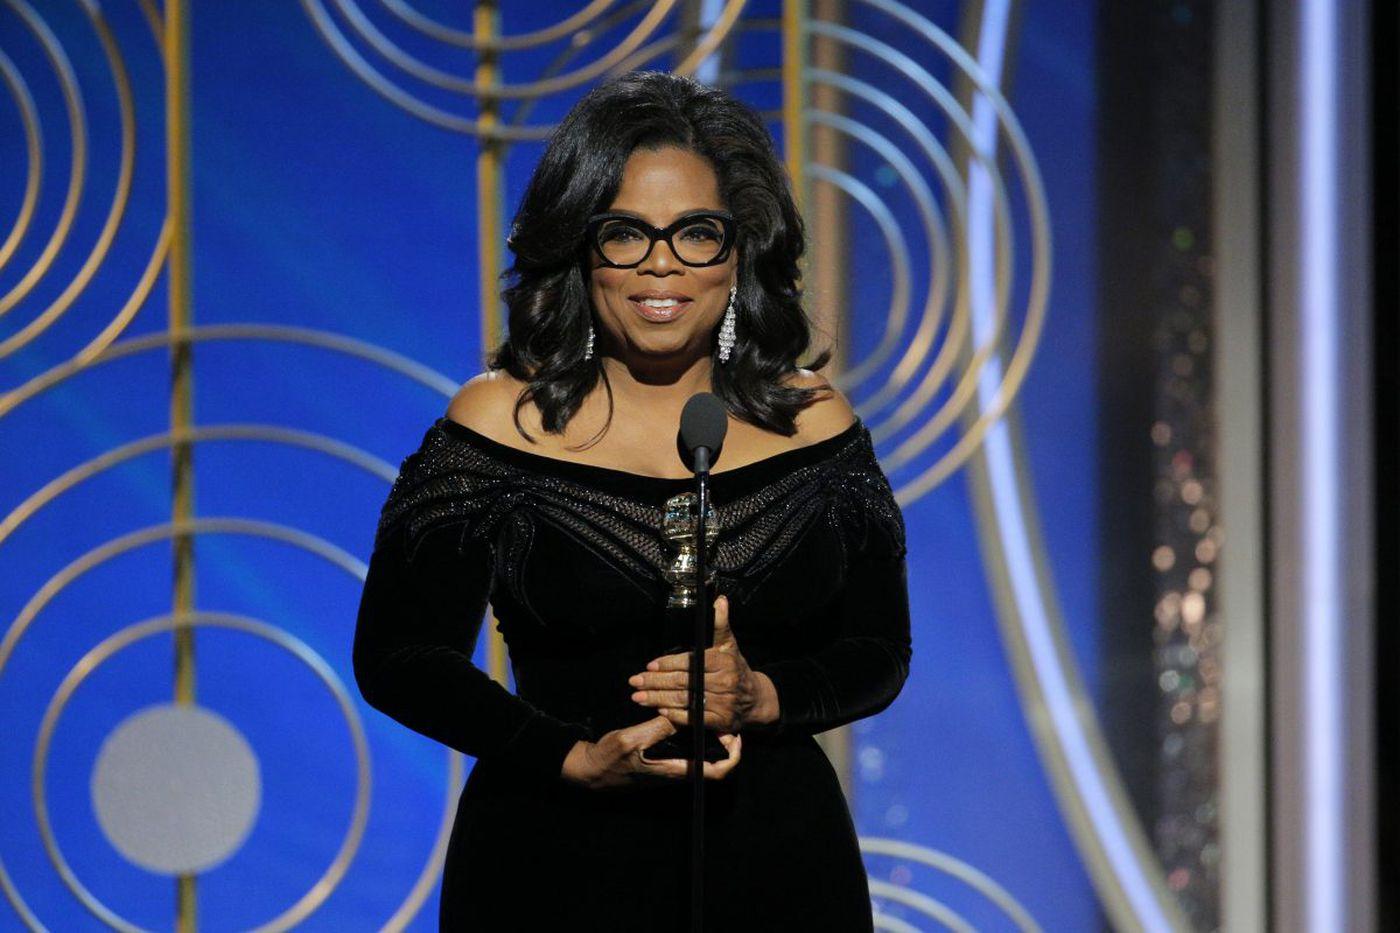 Golden Globes winners: Seth Meyers, Oprah, viewers tired of Trump jokes